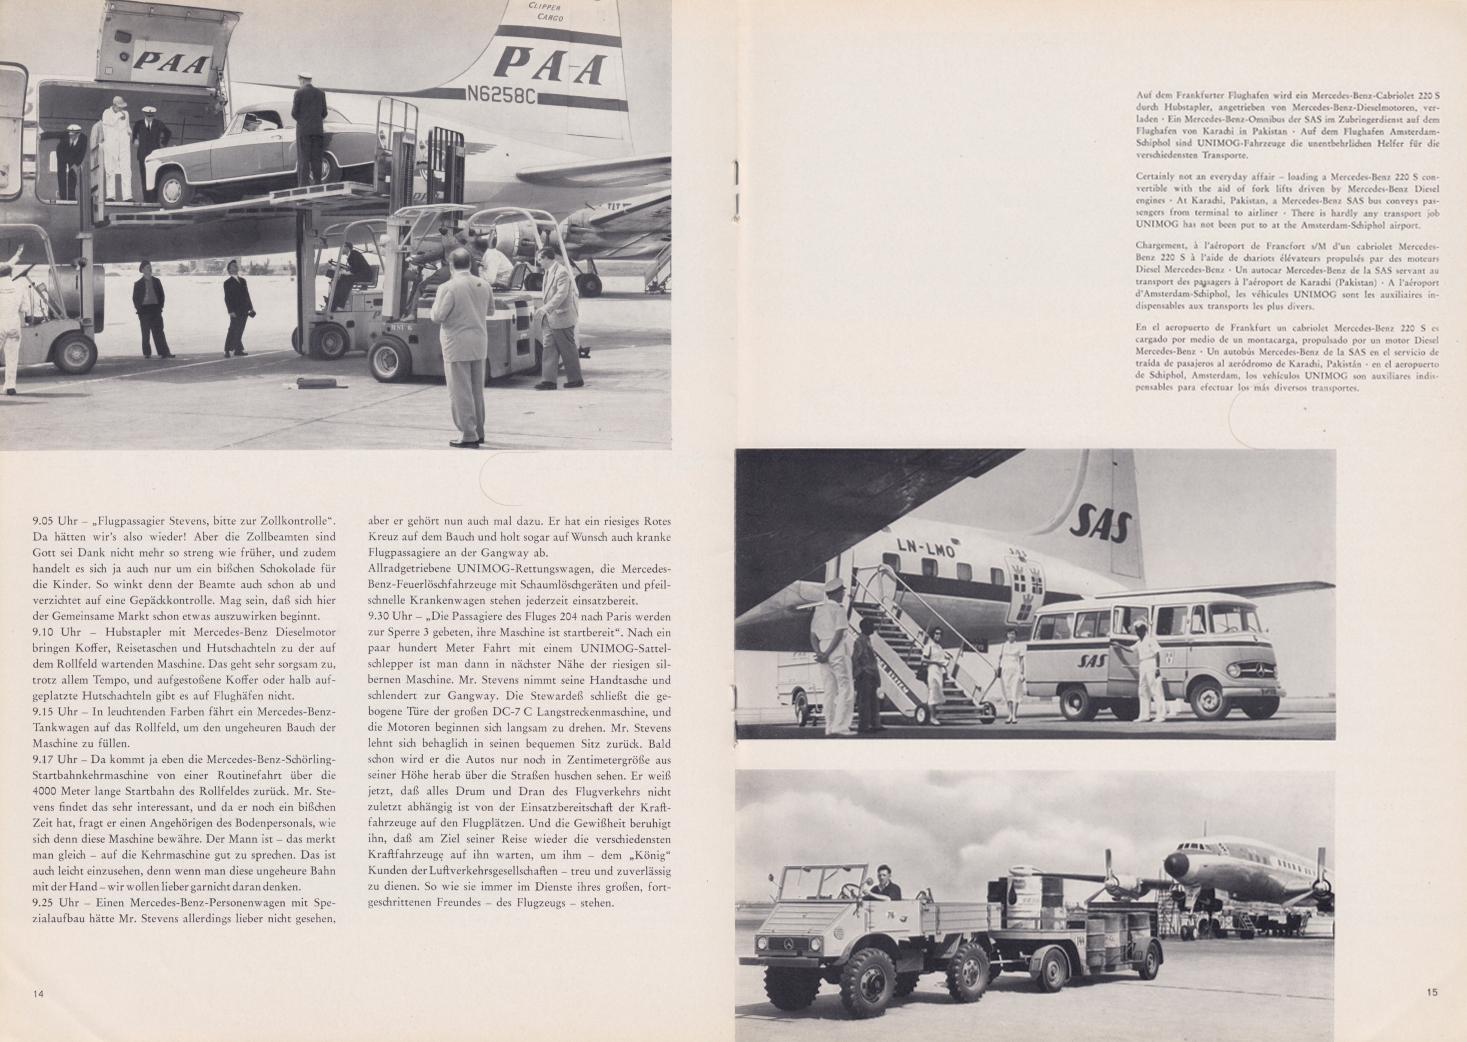 (REVISTA): Periódico In aller welt n.º 30 - Mercedes-Benz no mundo - 1959 - multilingue 008